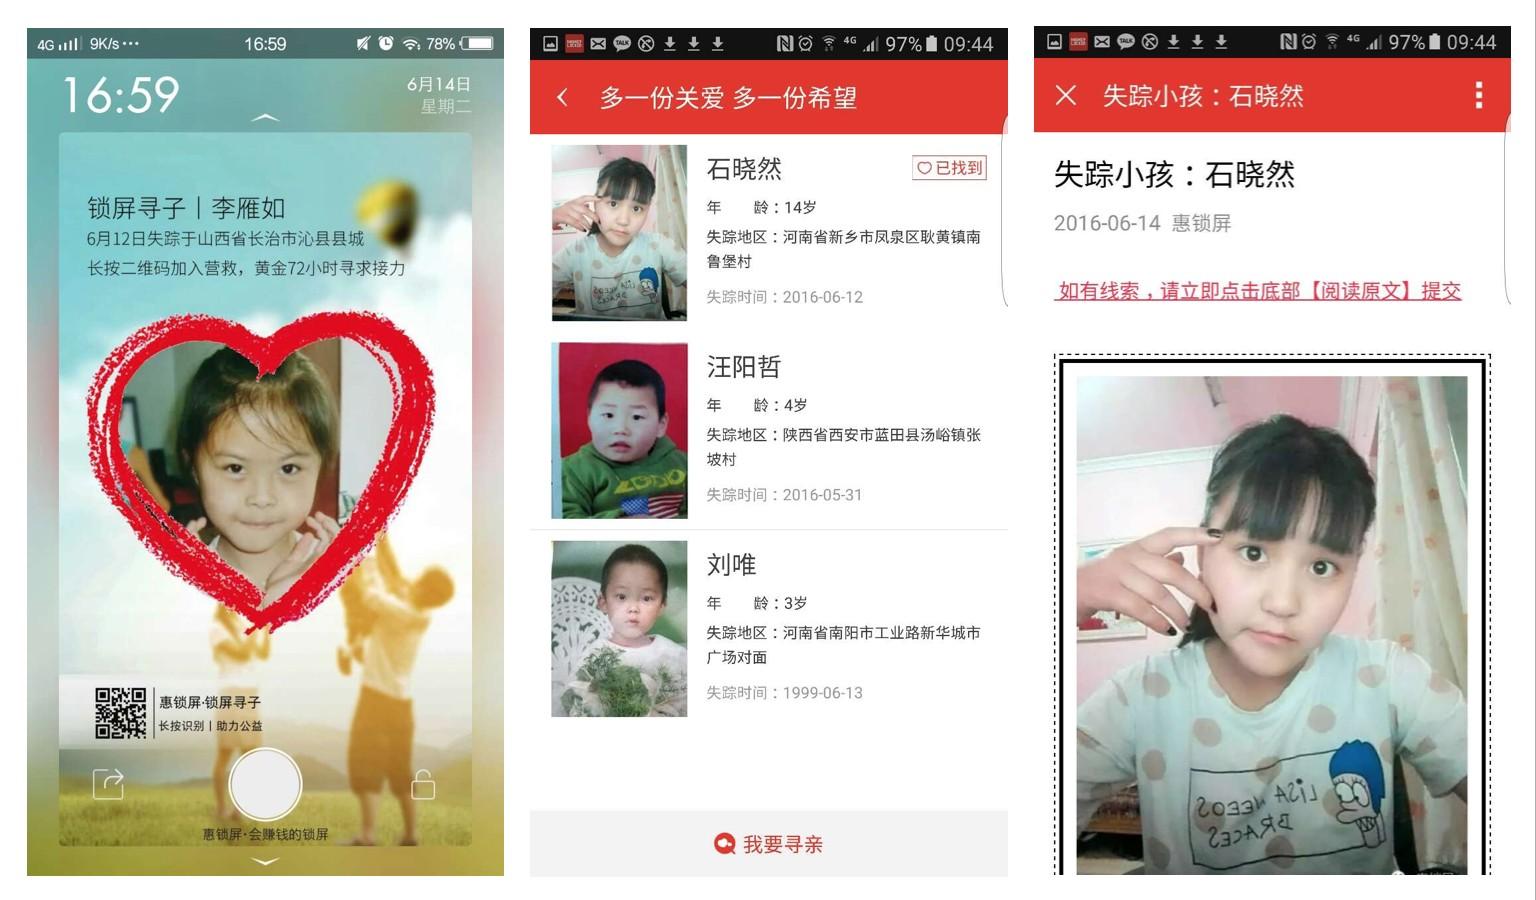 This Advertising Startup Found Three Missing Children in